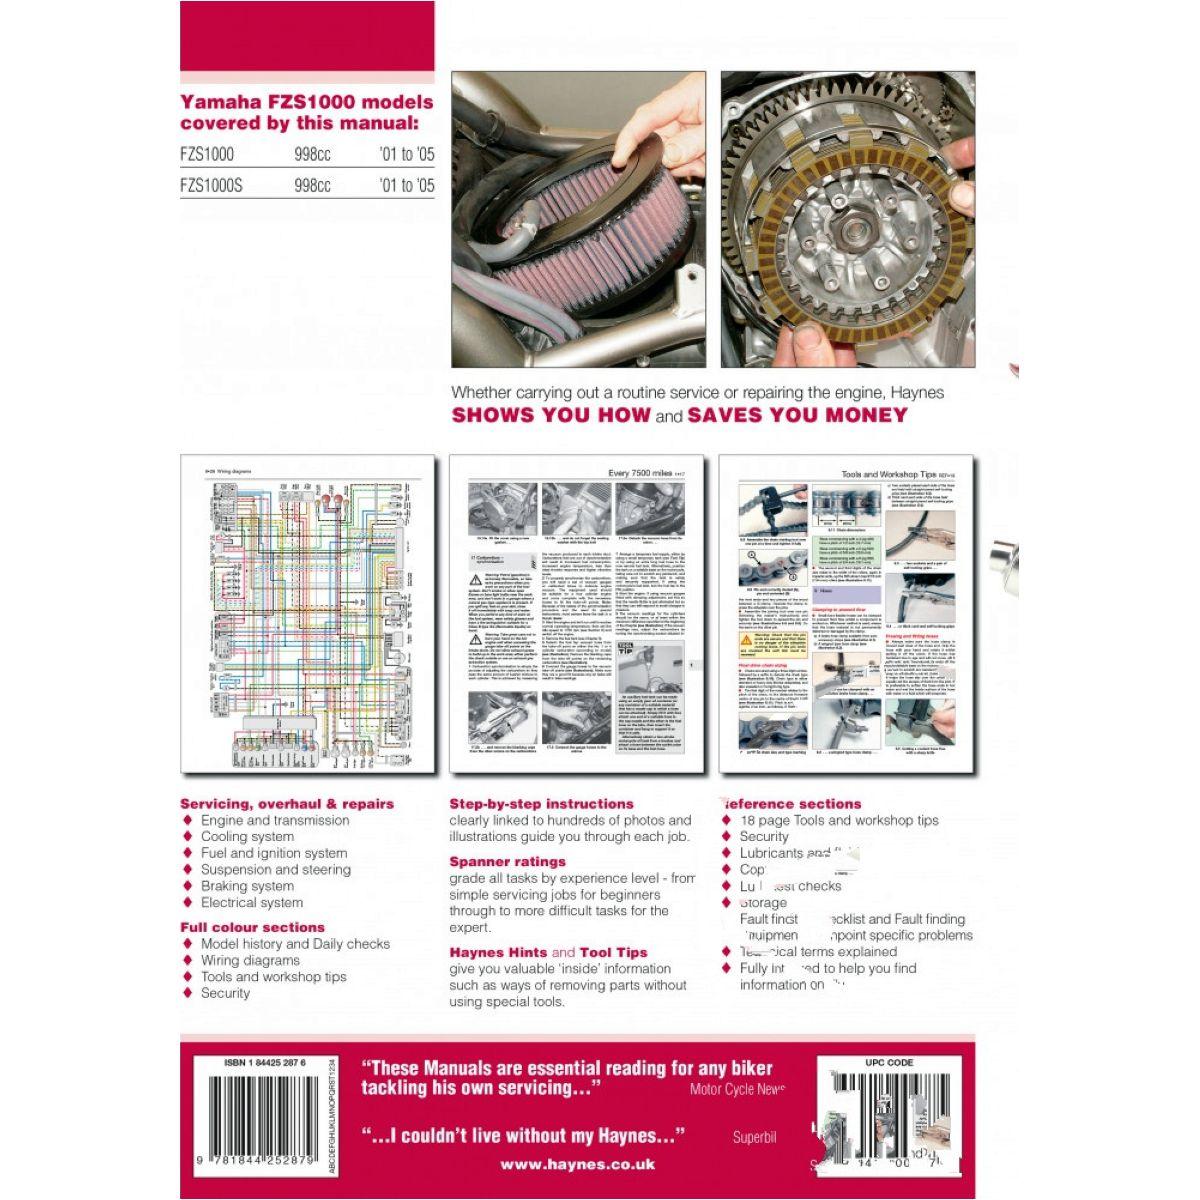 repair manual für Yamaha Anleitung Reparatur